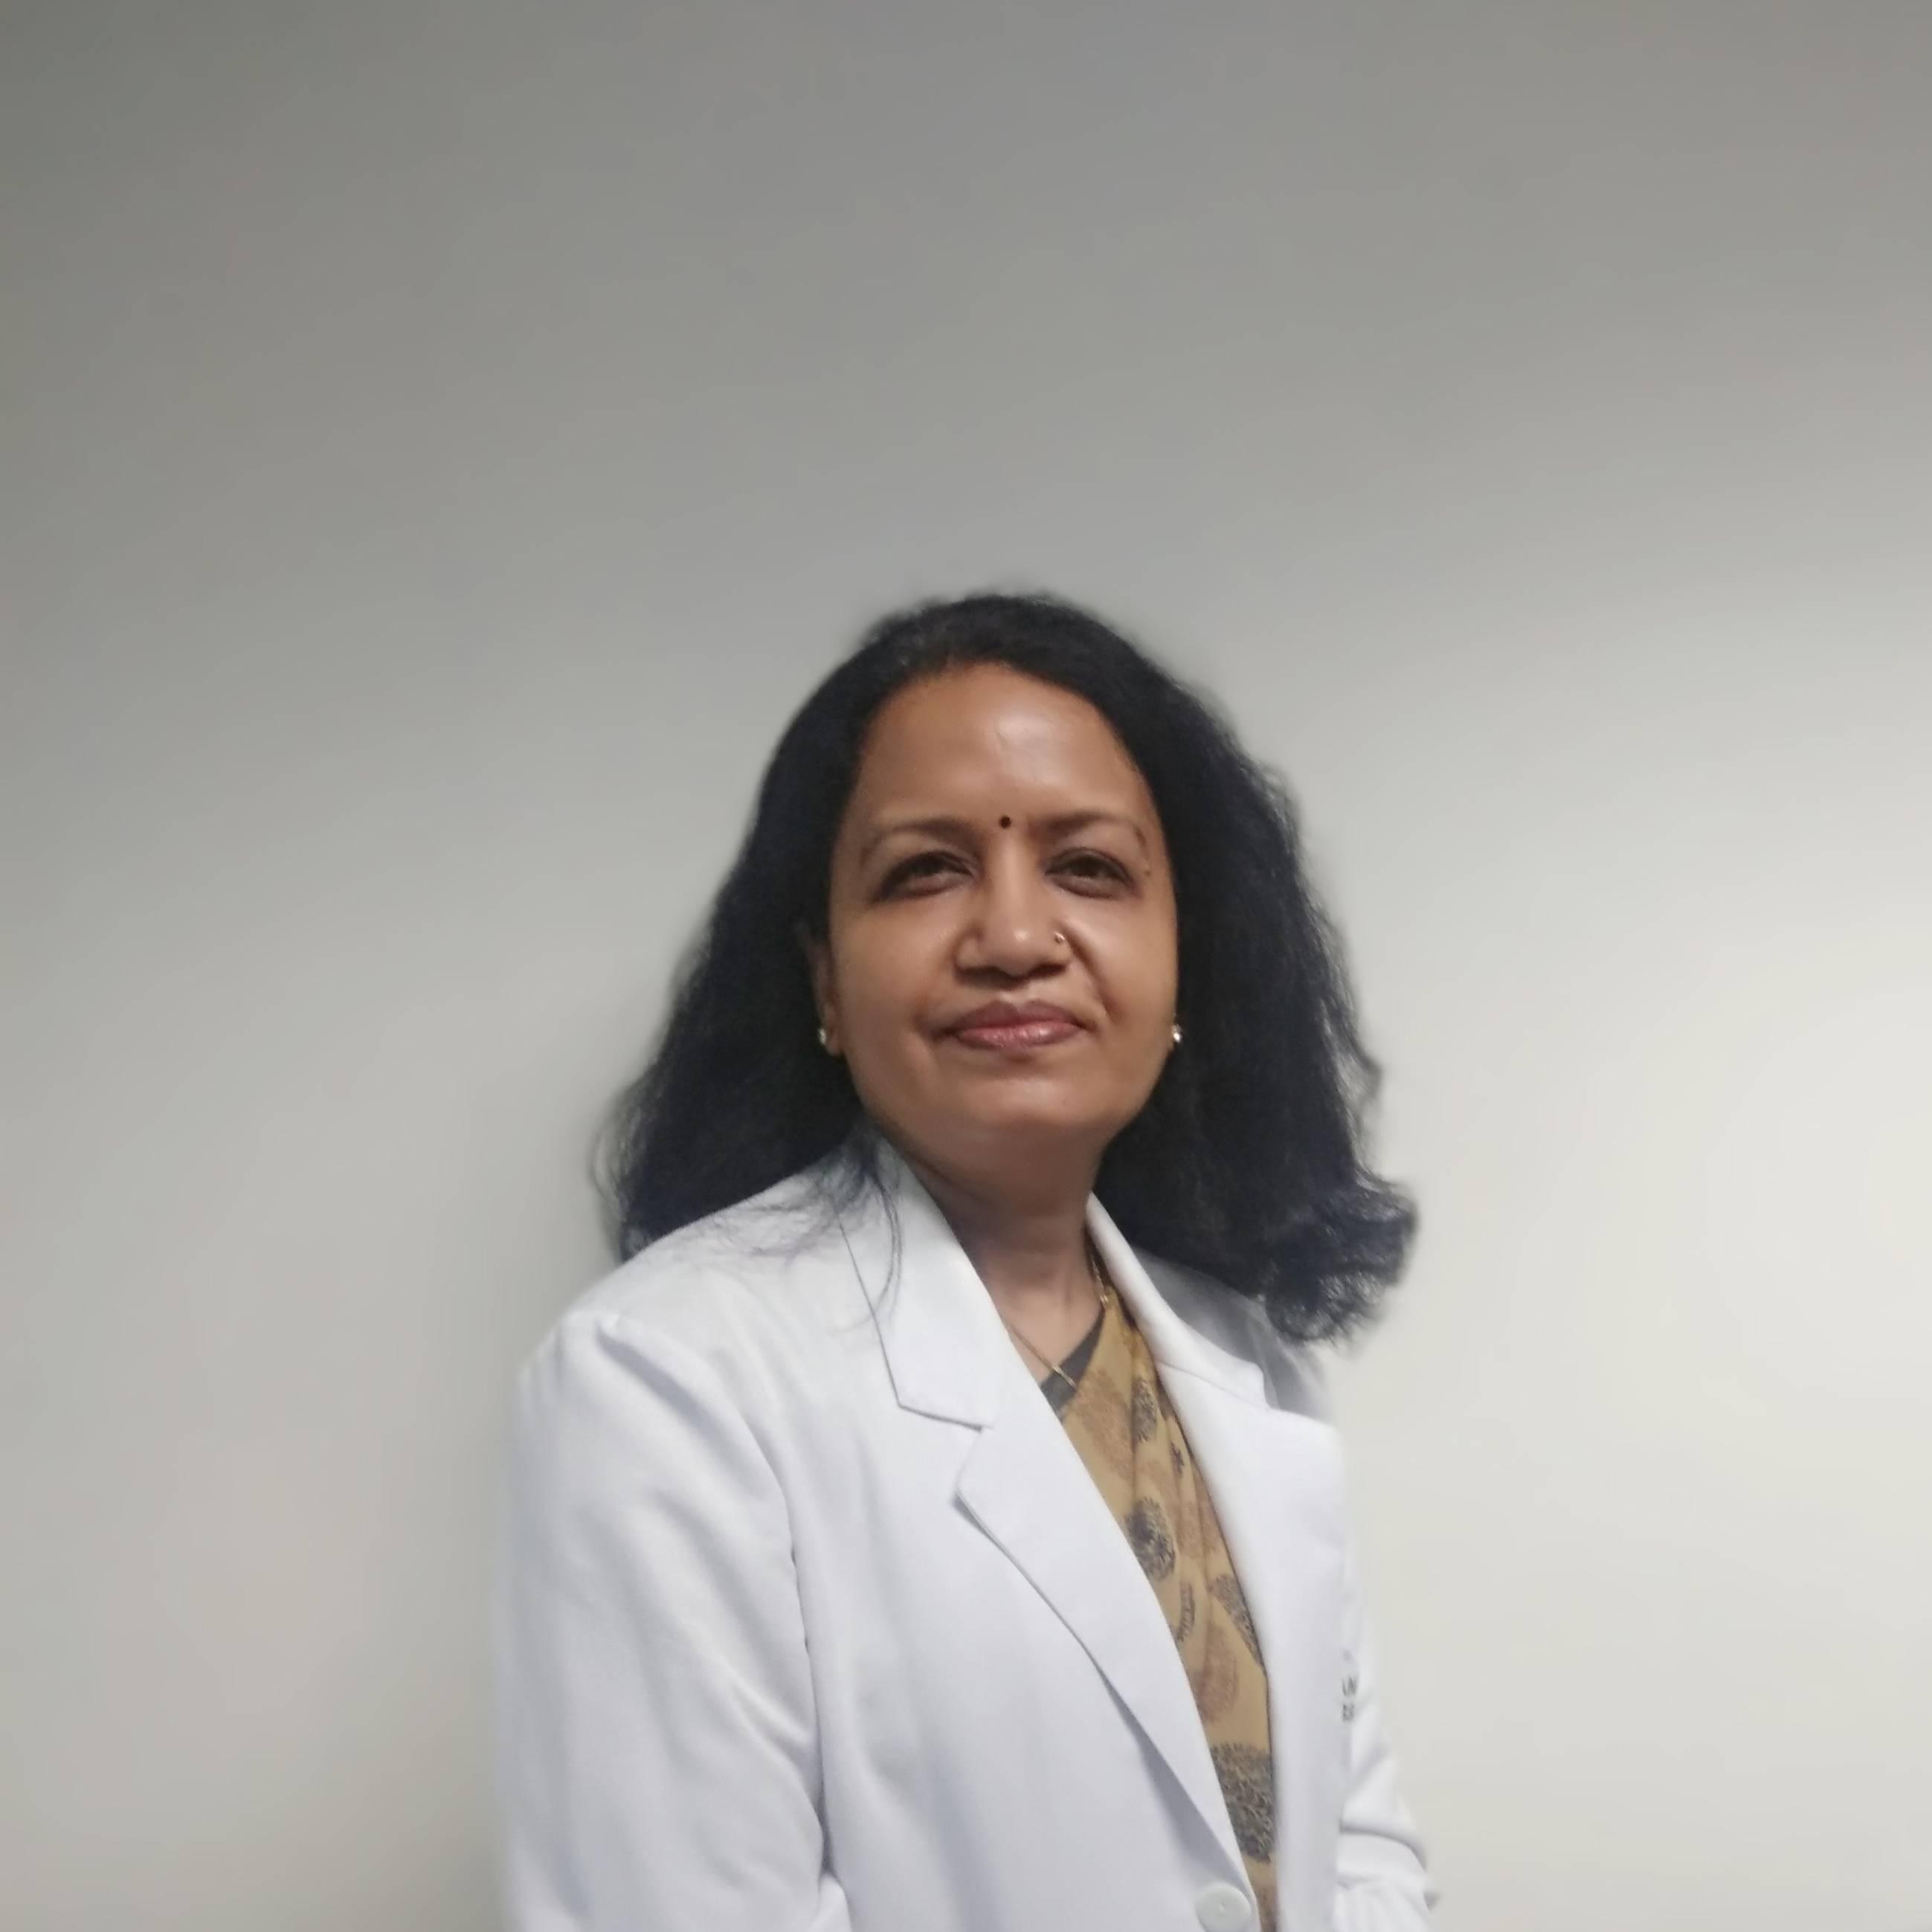 Dr. Mamta Sahu